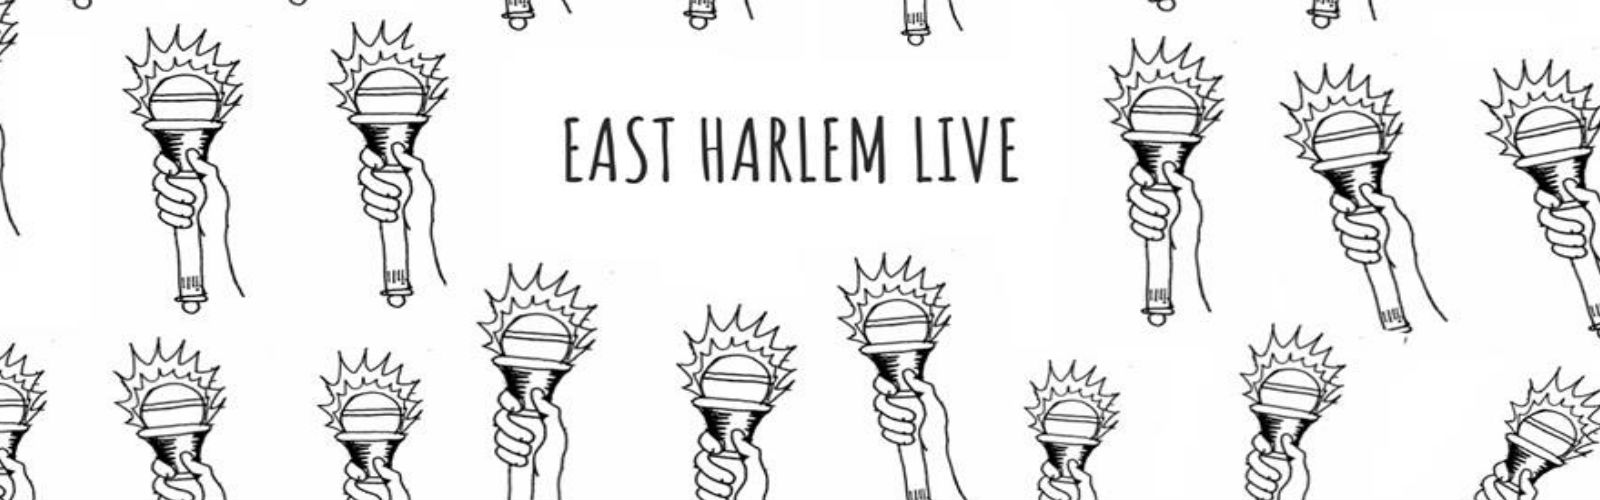 UPTOWN BOUNCE | East Harlem Live